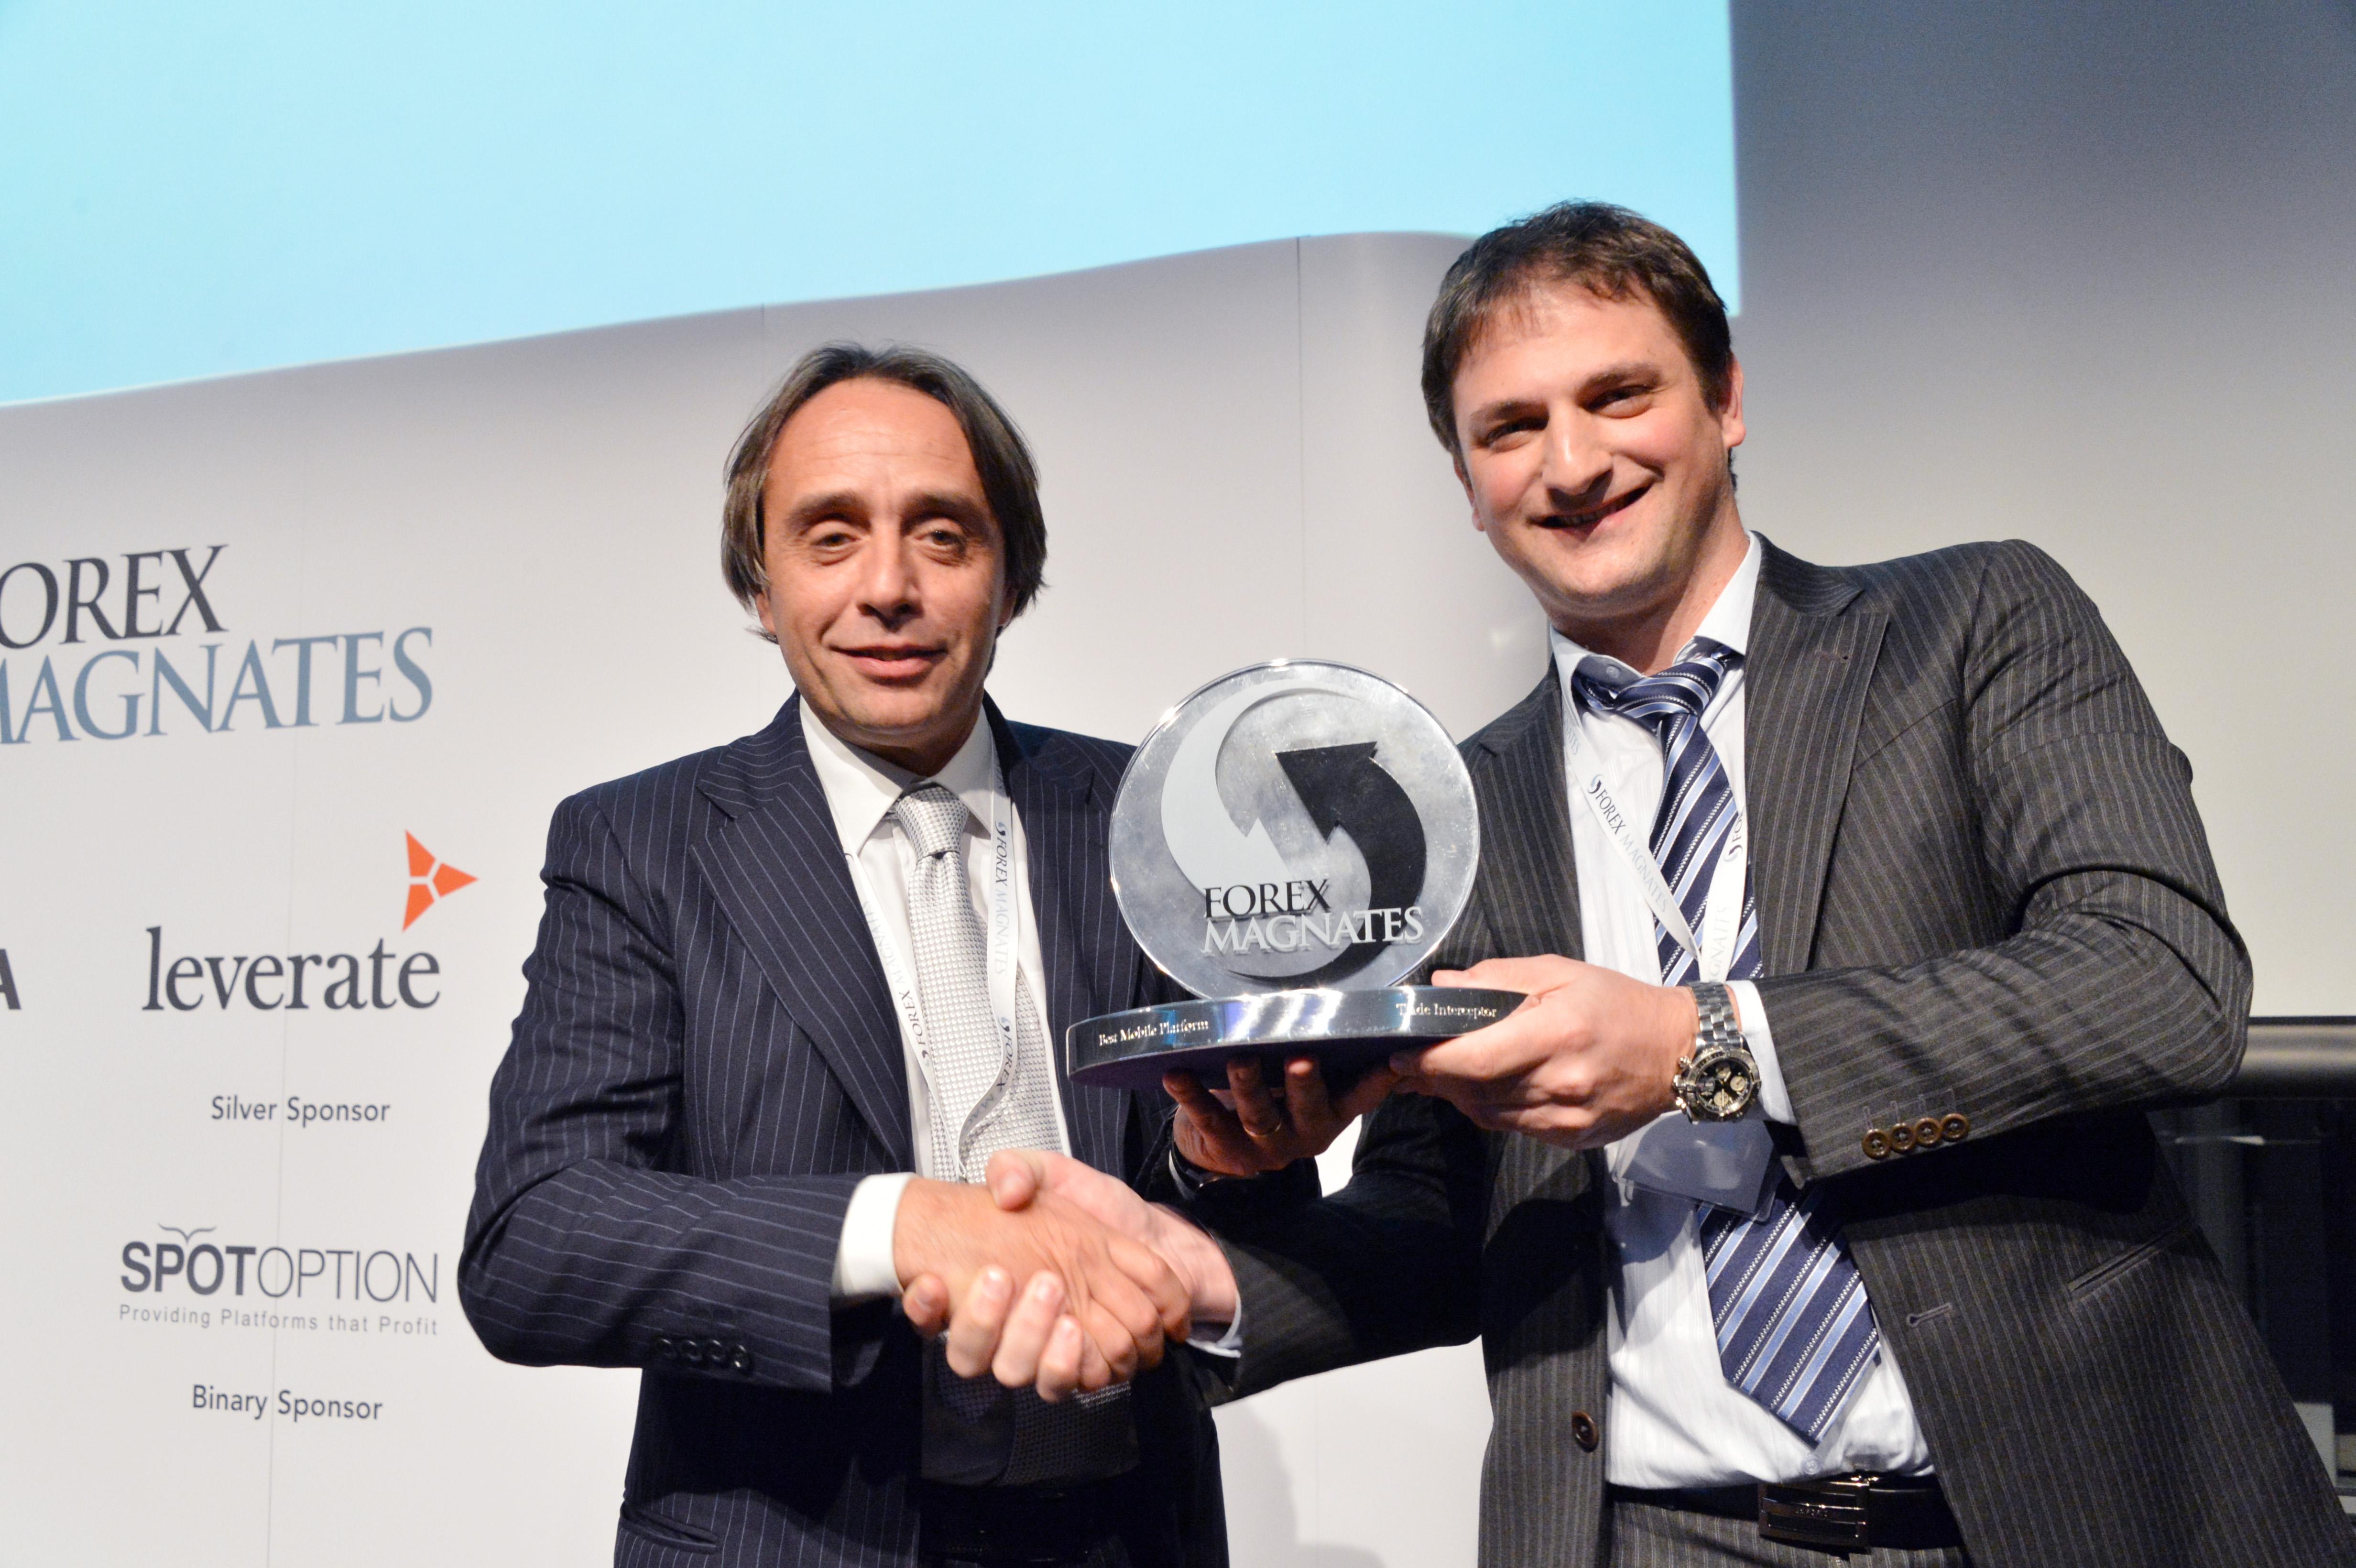 forex magnates award